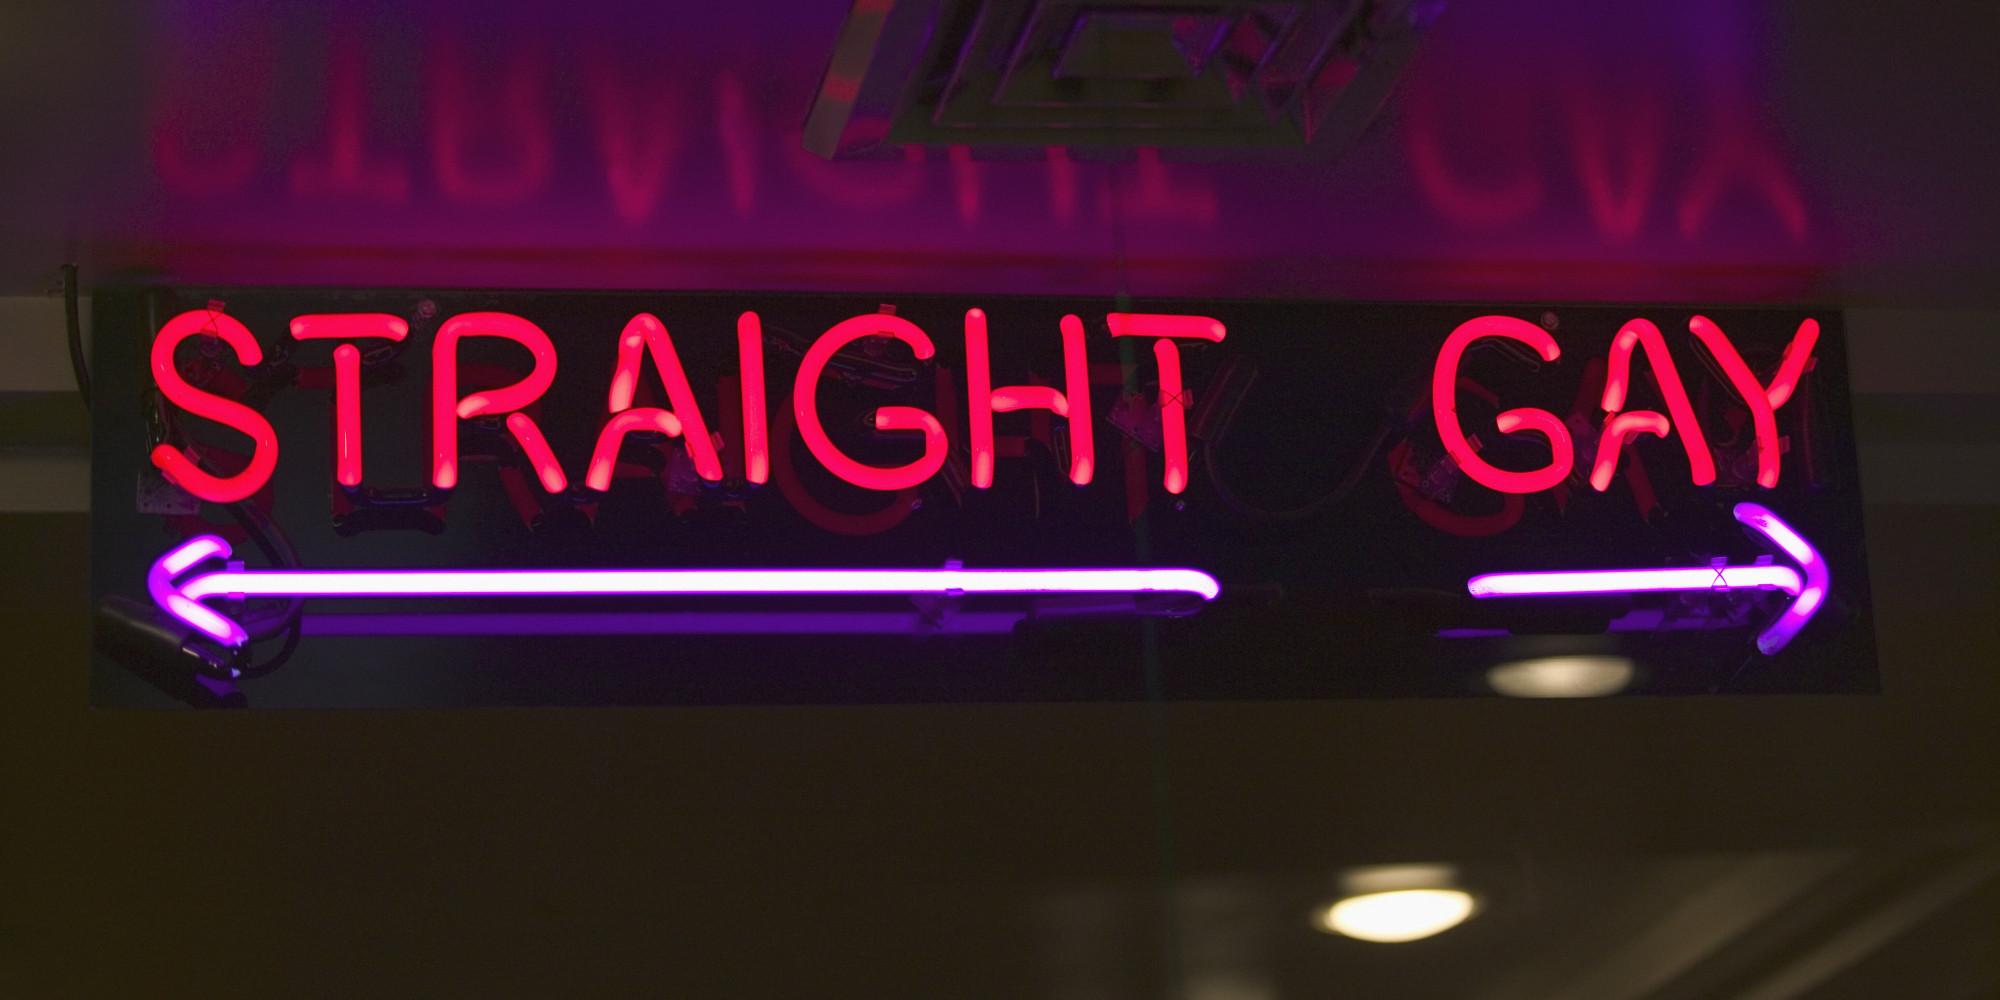 contract bisexual erasure The of epistemic